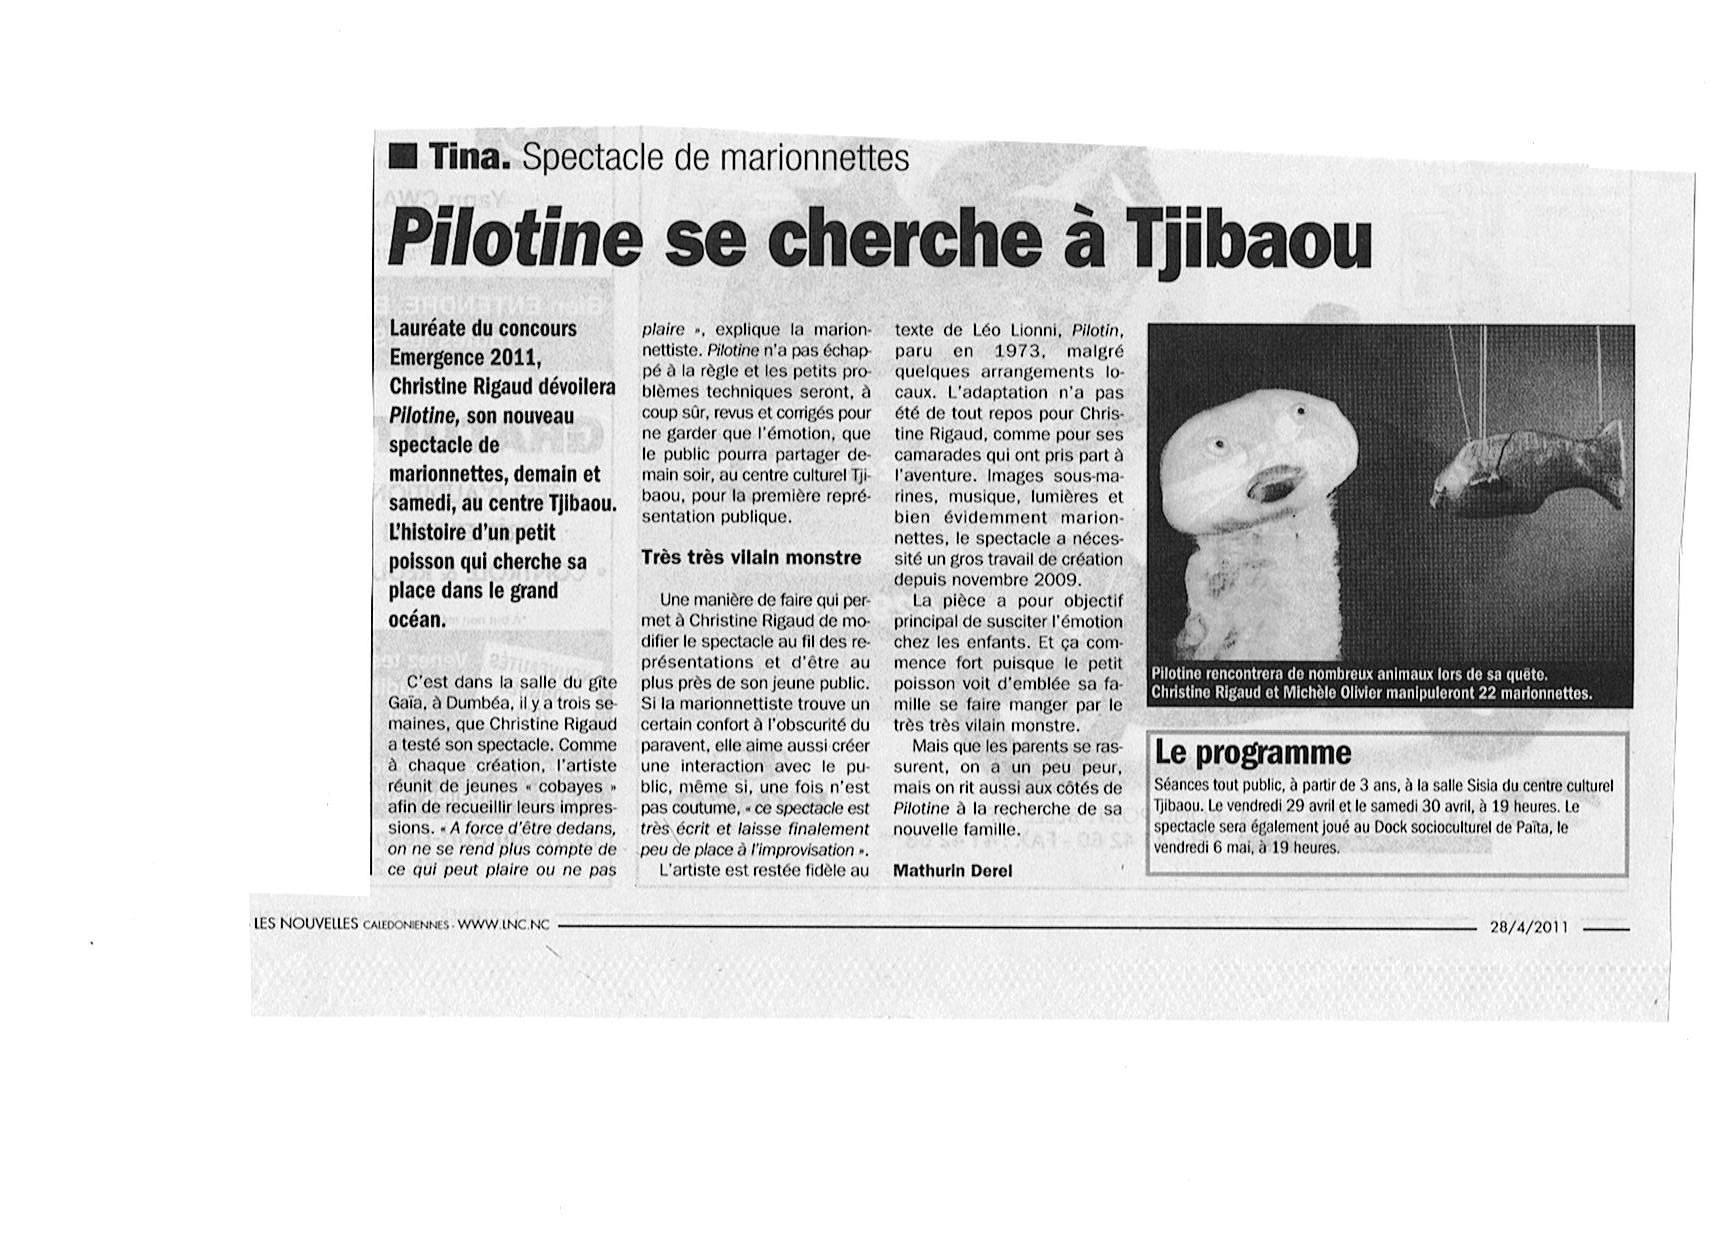 Pilotine LNC 28 avril